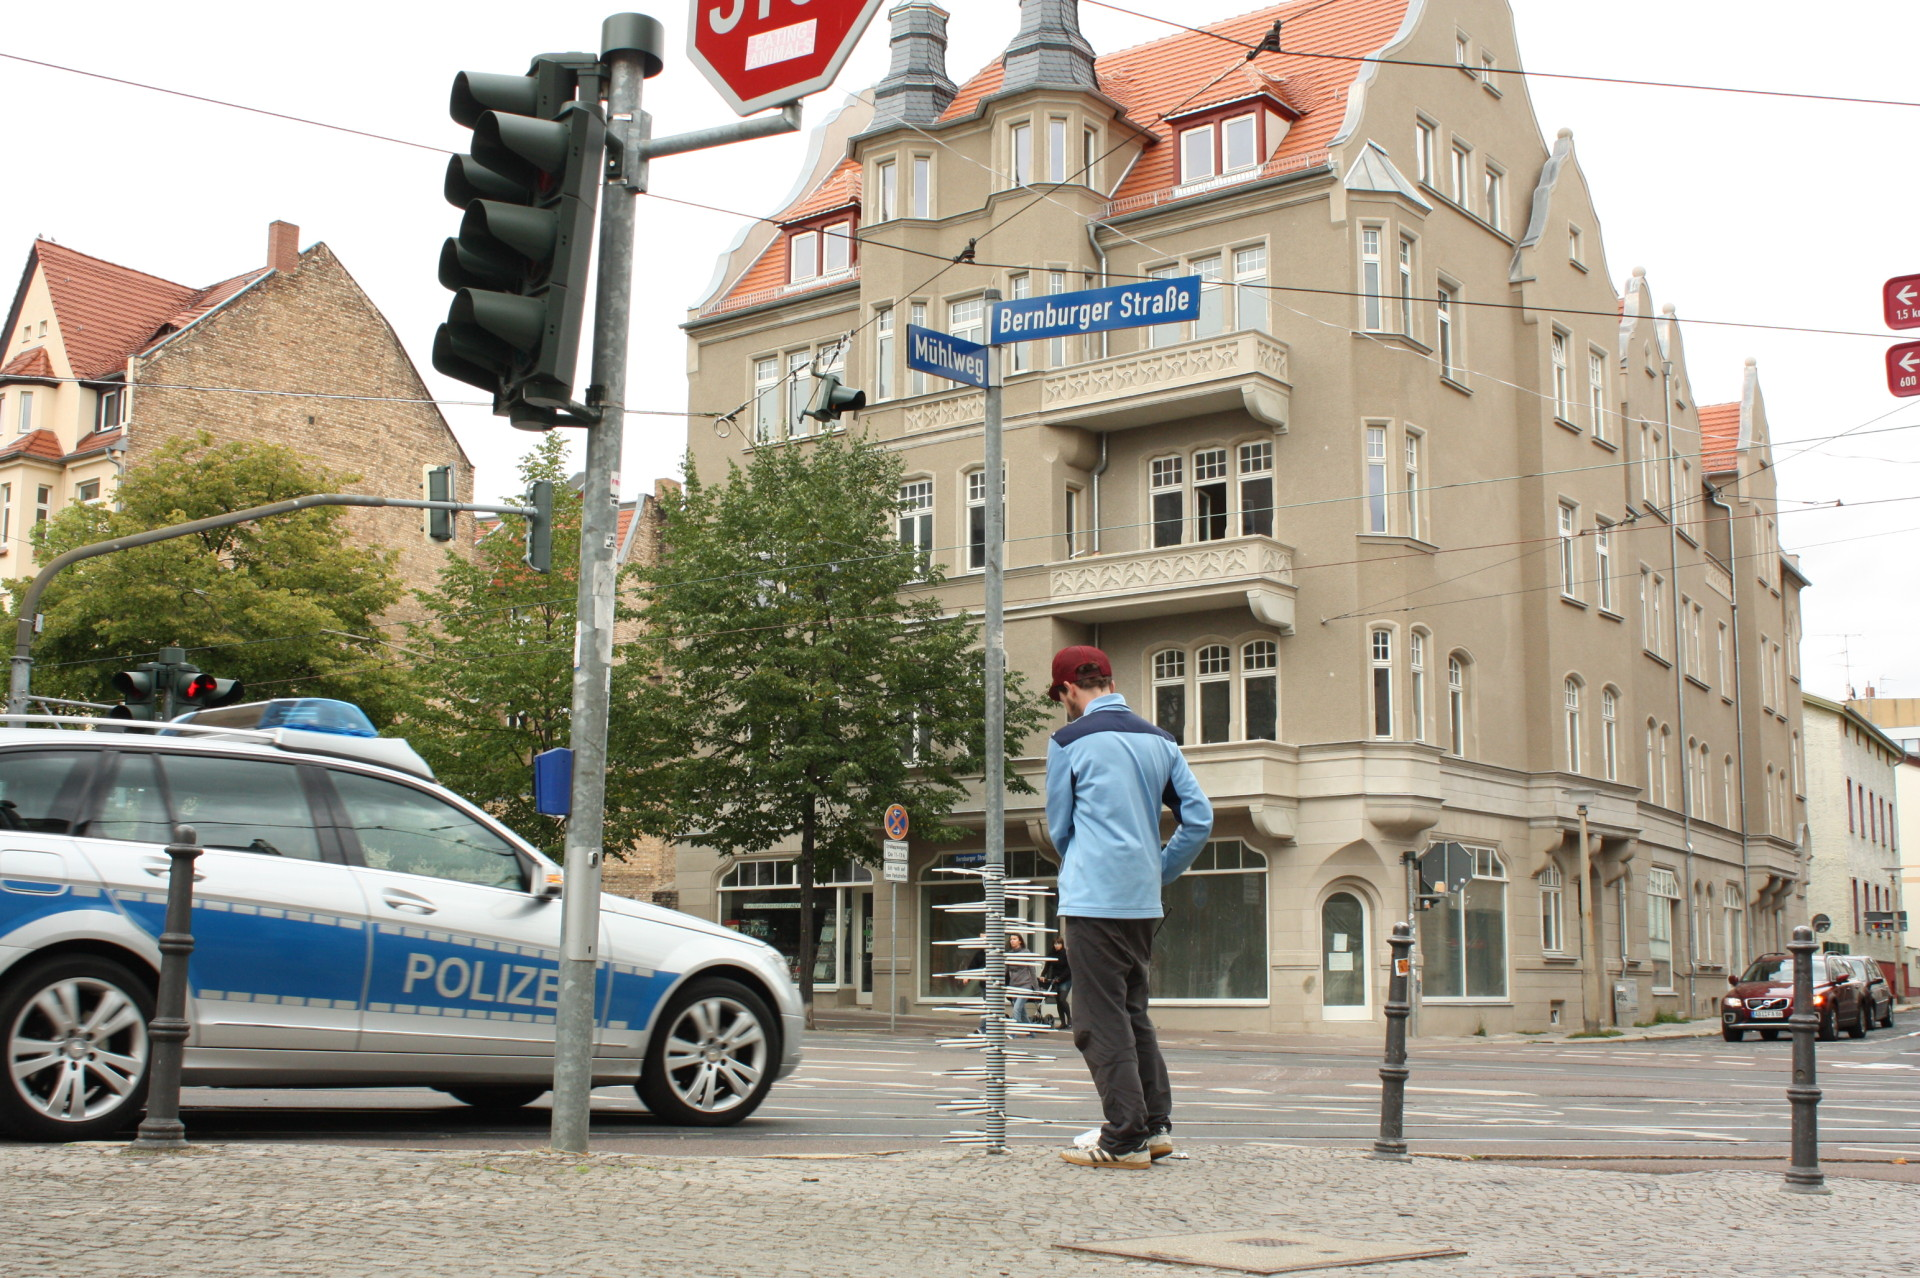 LUKAS ADOLPHI Mühlweg Ecke Bernburger Straße – Halle/Saale